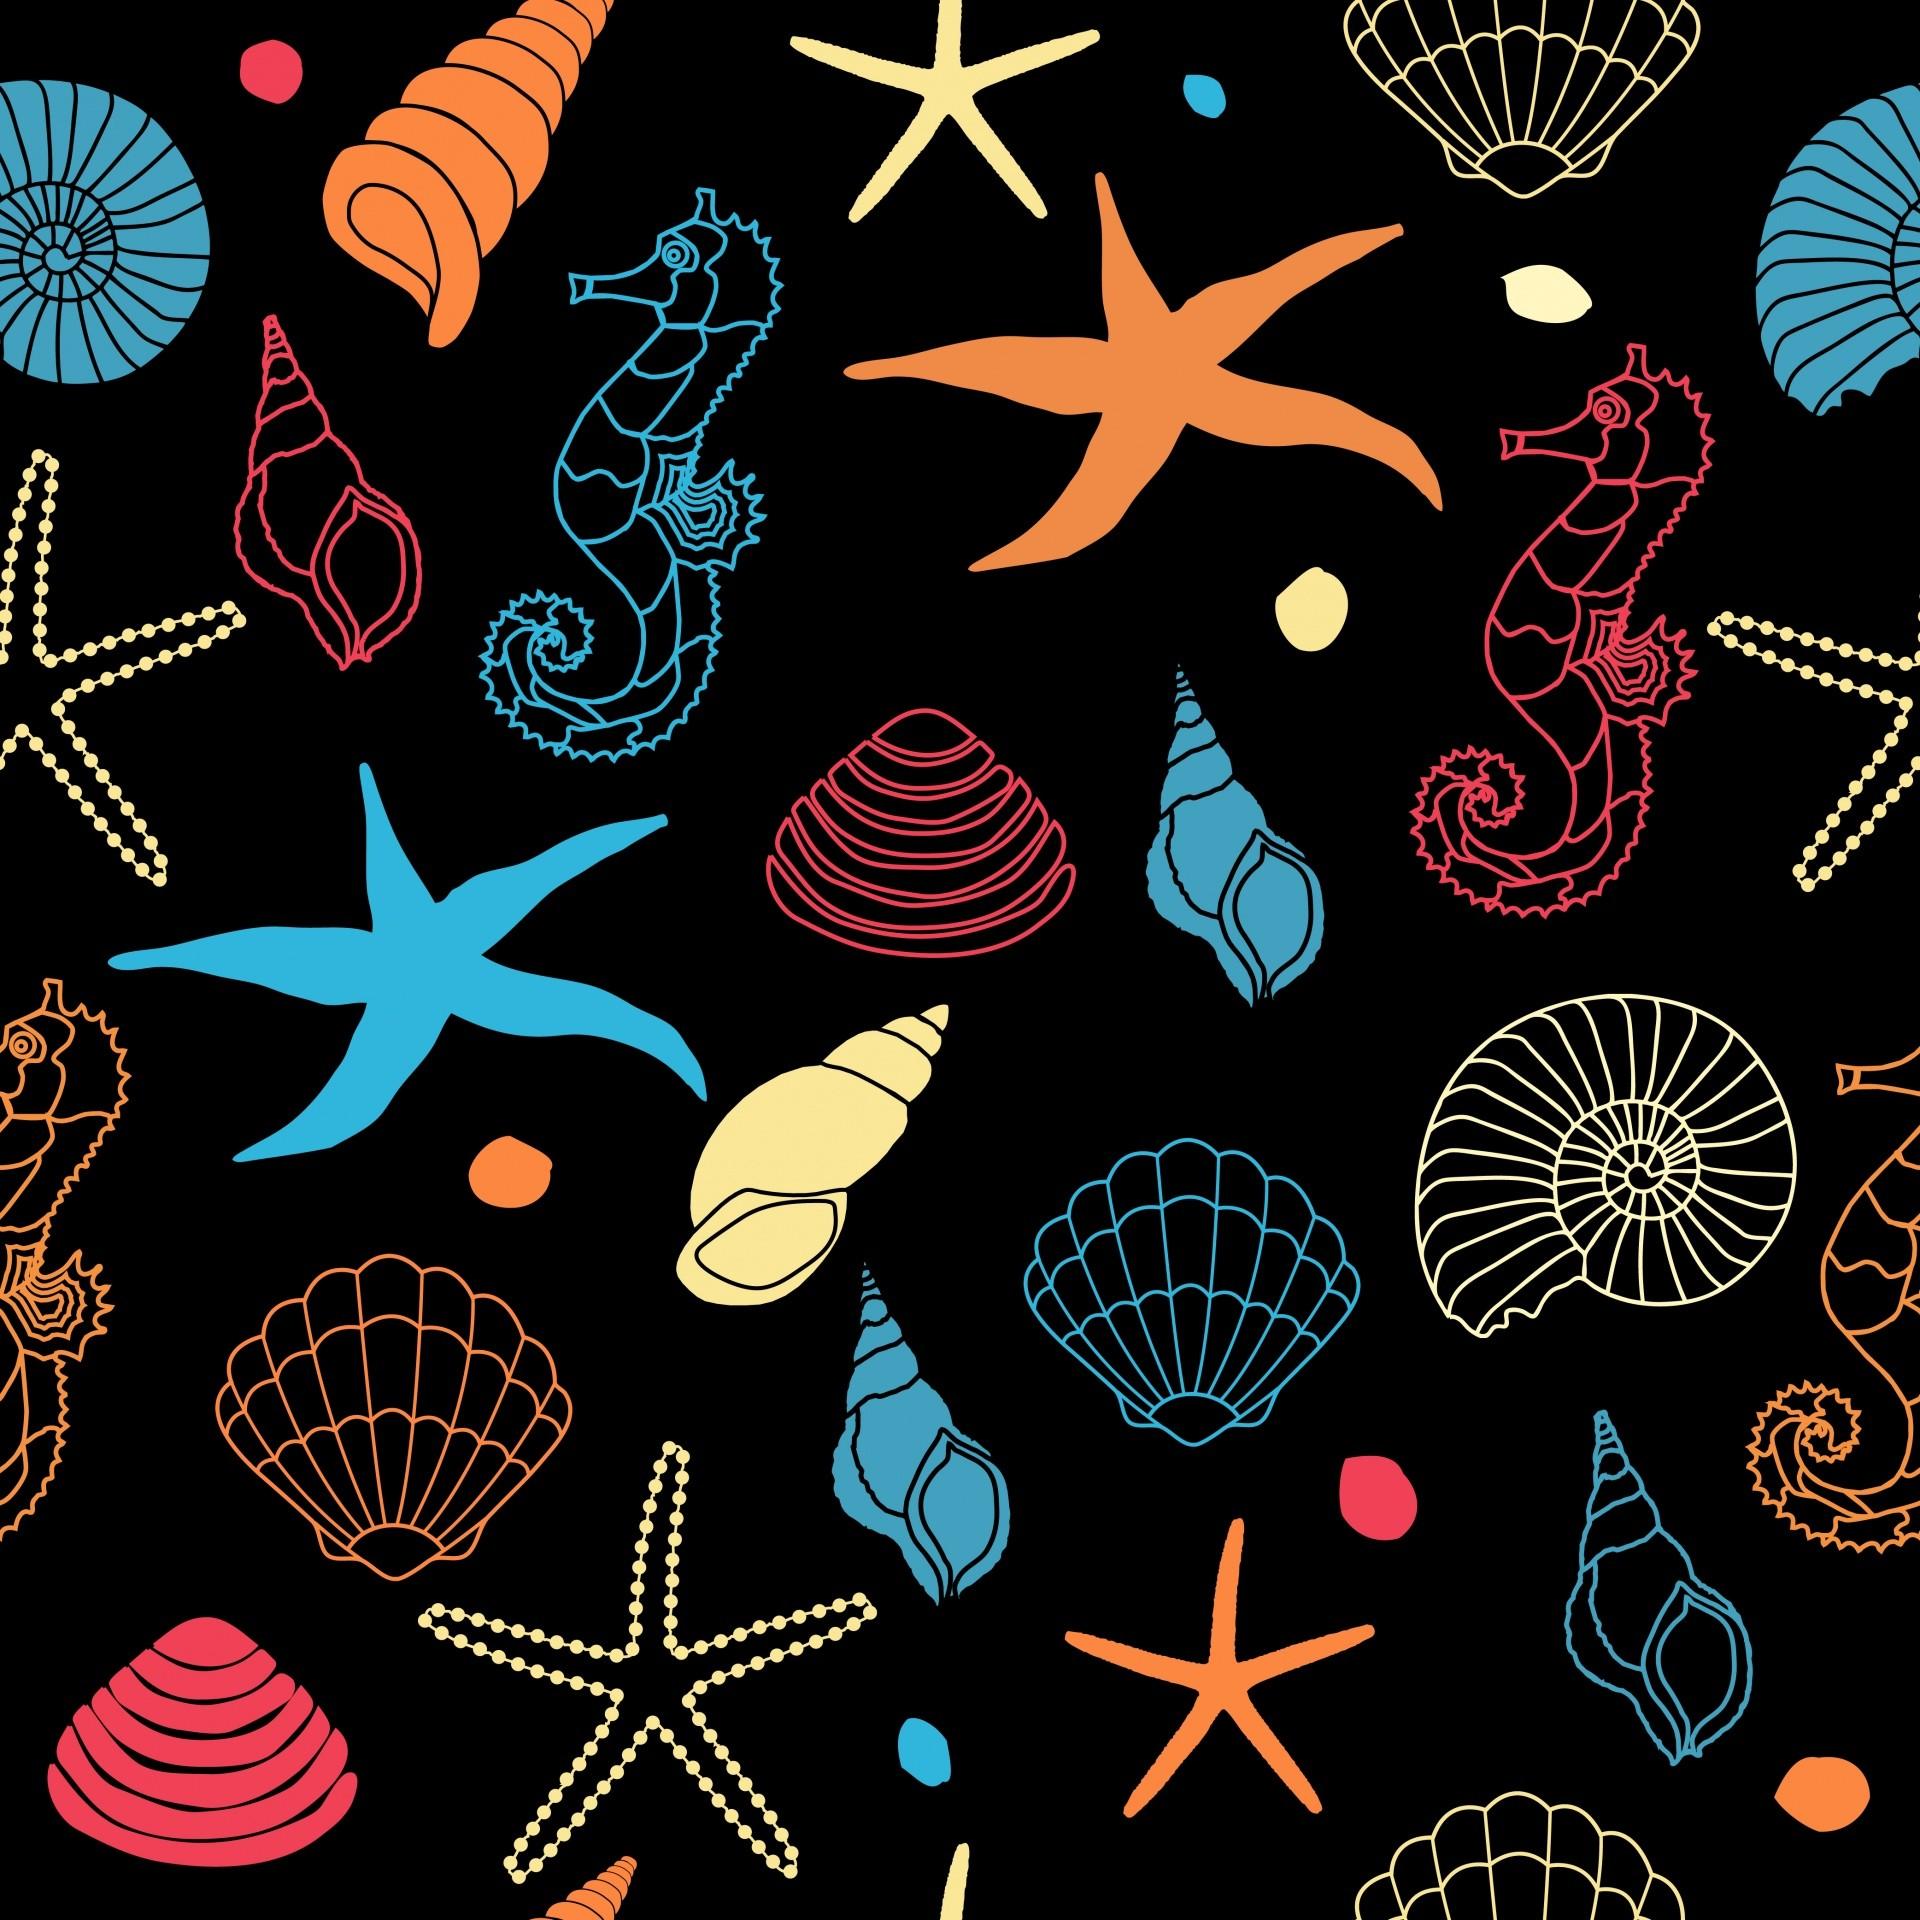 Res: 1920x1920, Seahorse, Starfish Wallpaper